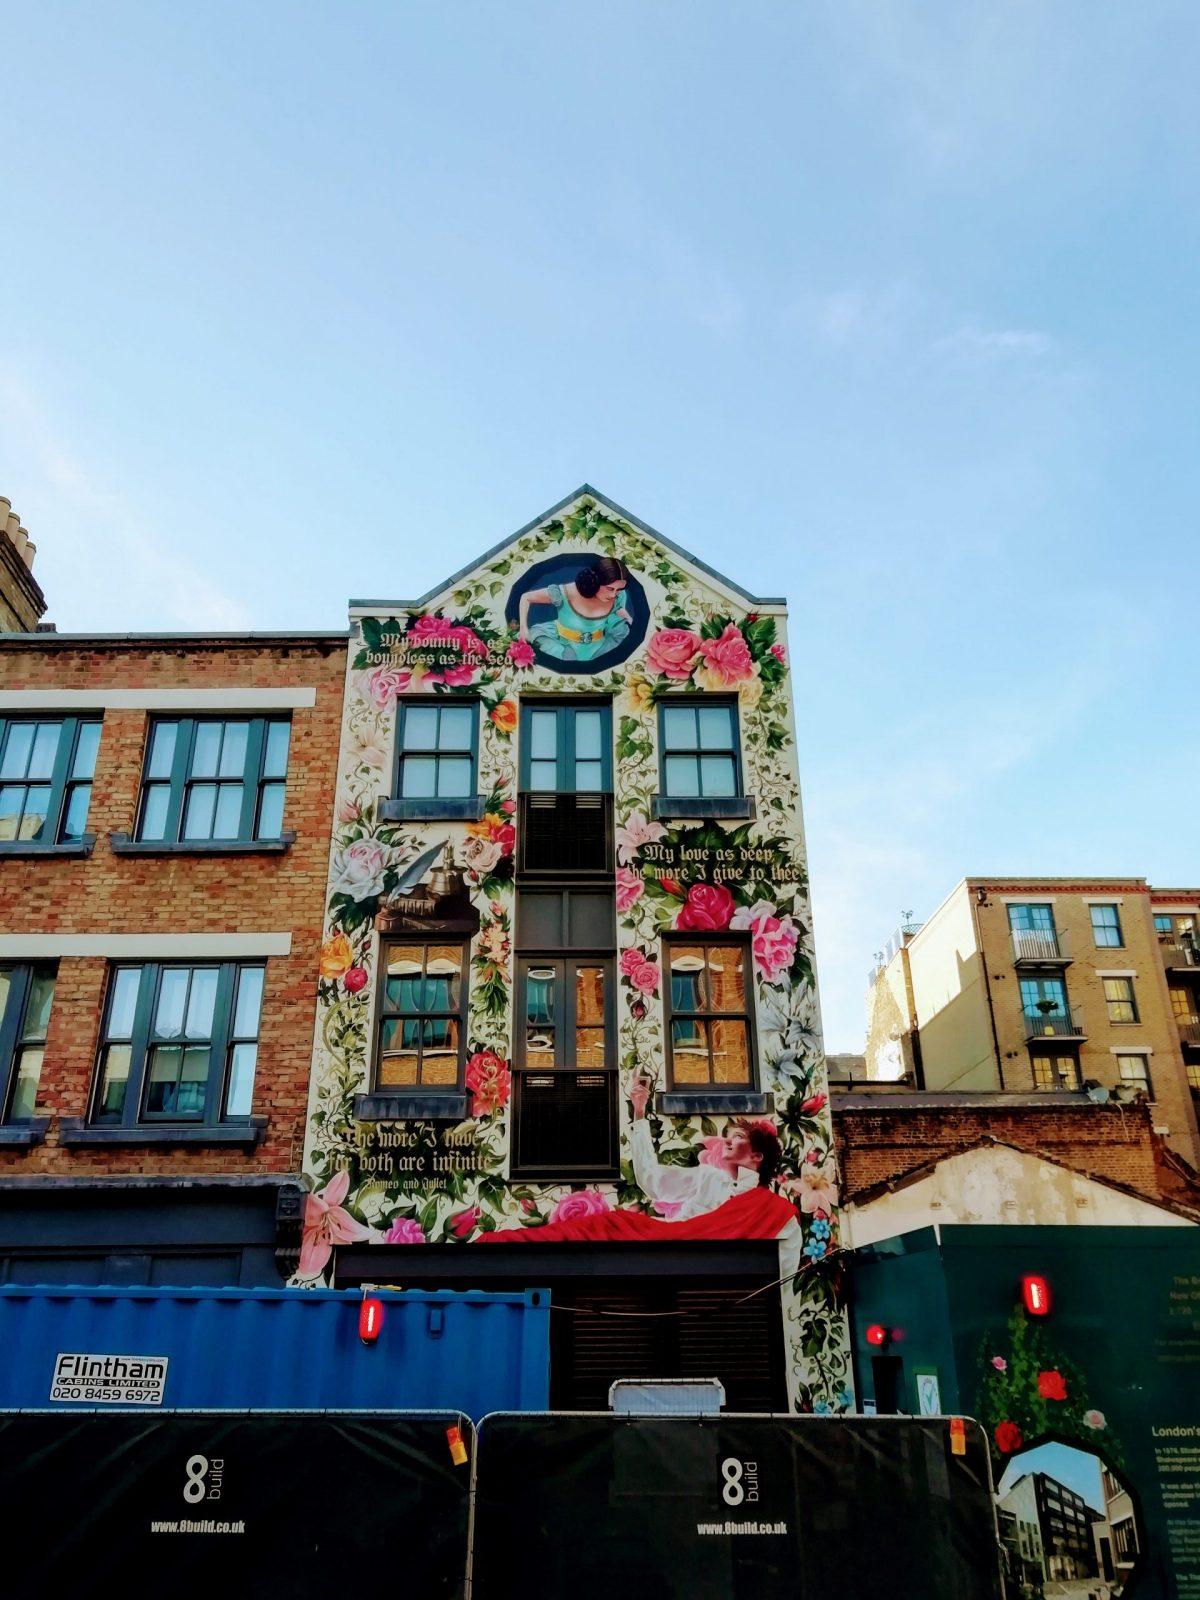 New Street Art in London: Alternative London Walking Tour Review 34